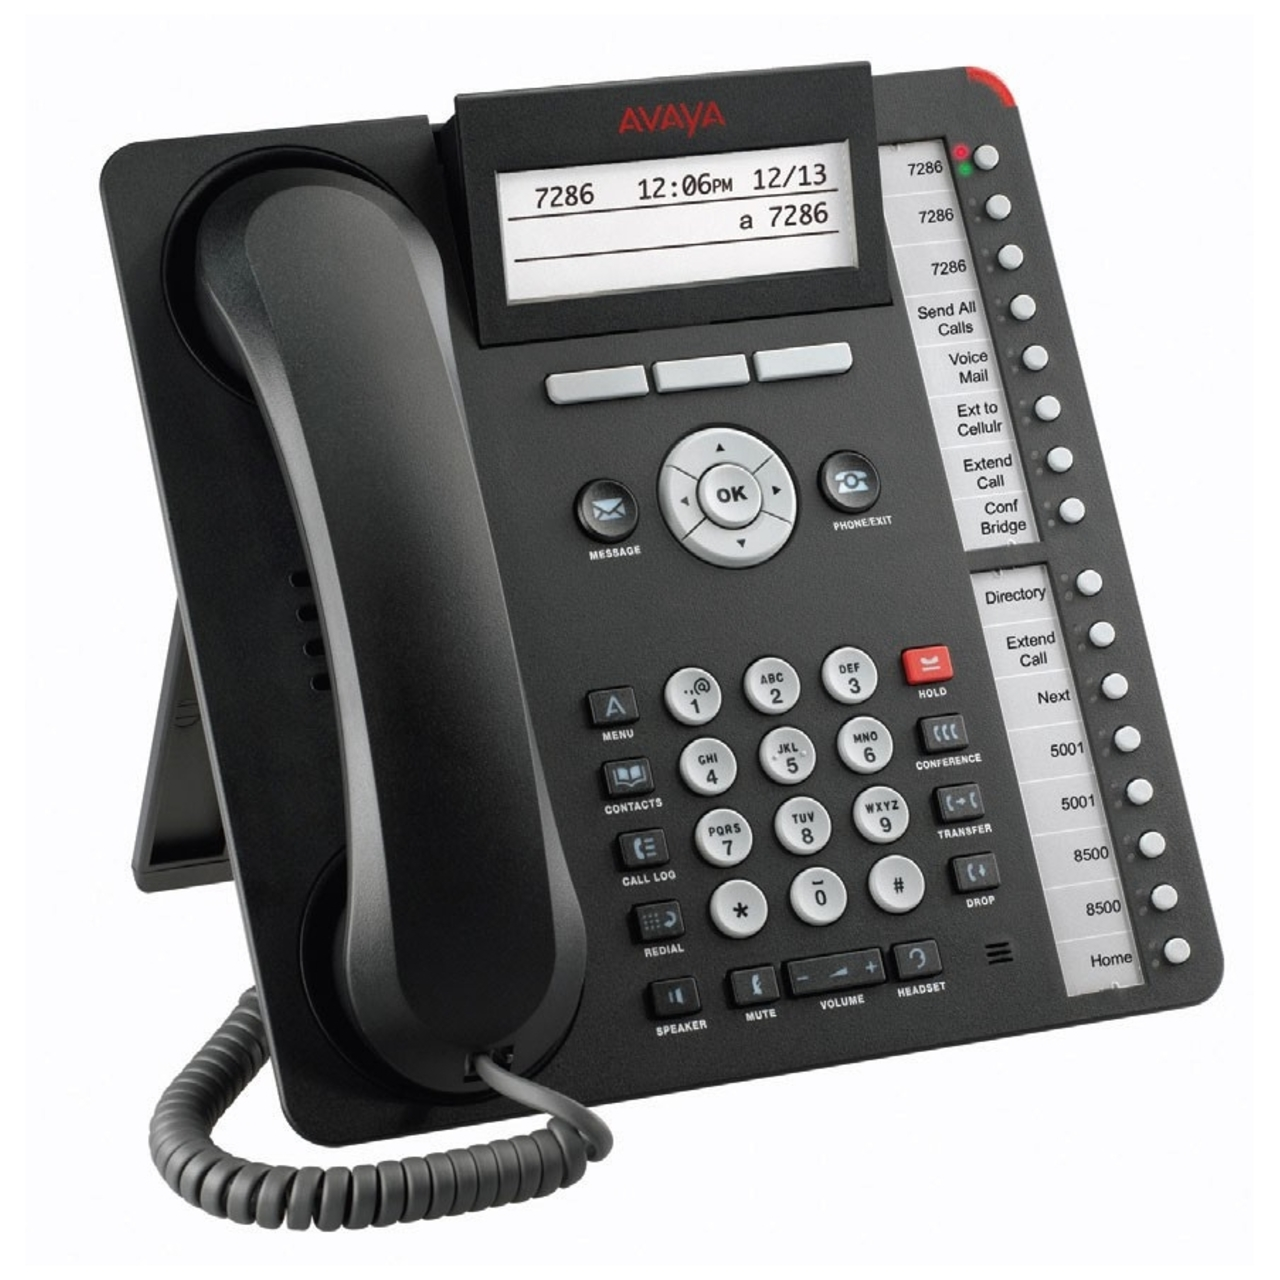 avaya phones user manuals schematic service manuals pdf rh mobilephone manualsonline com avaya partner phone user manual Vzw Phones User Guide